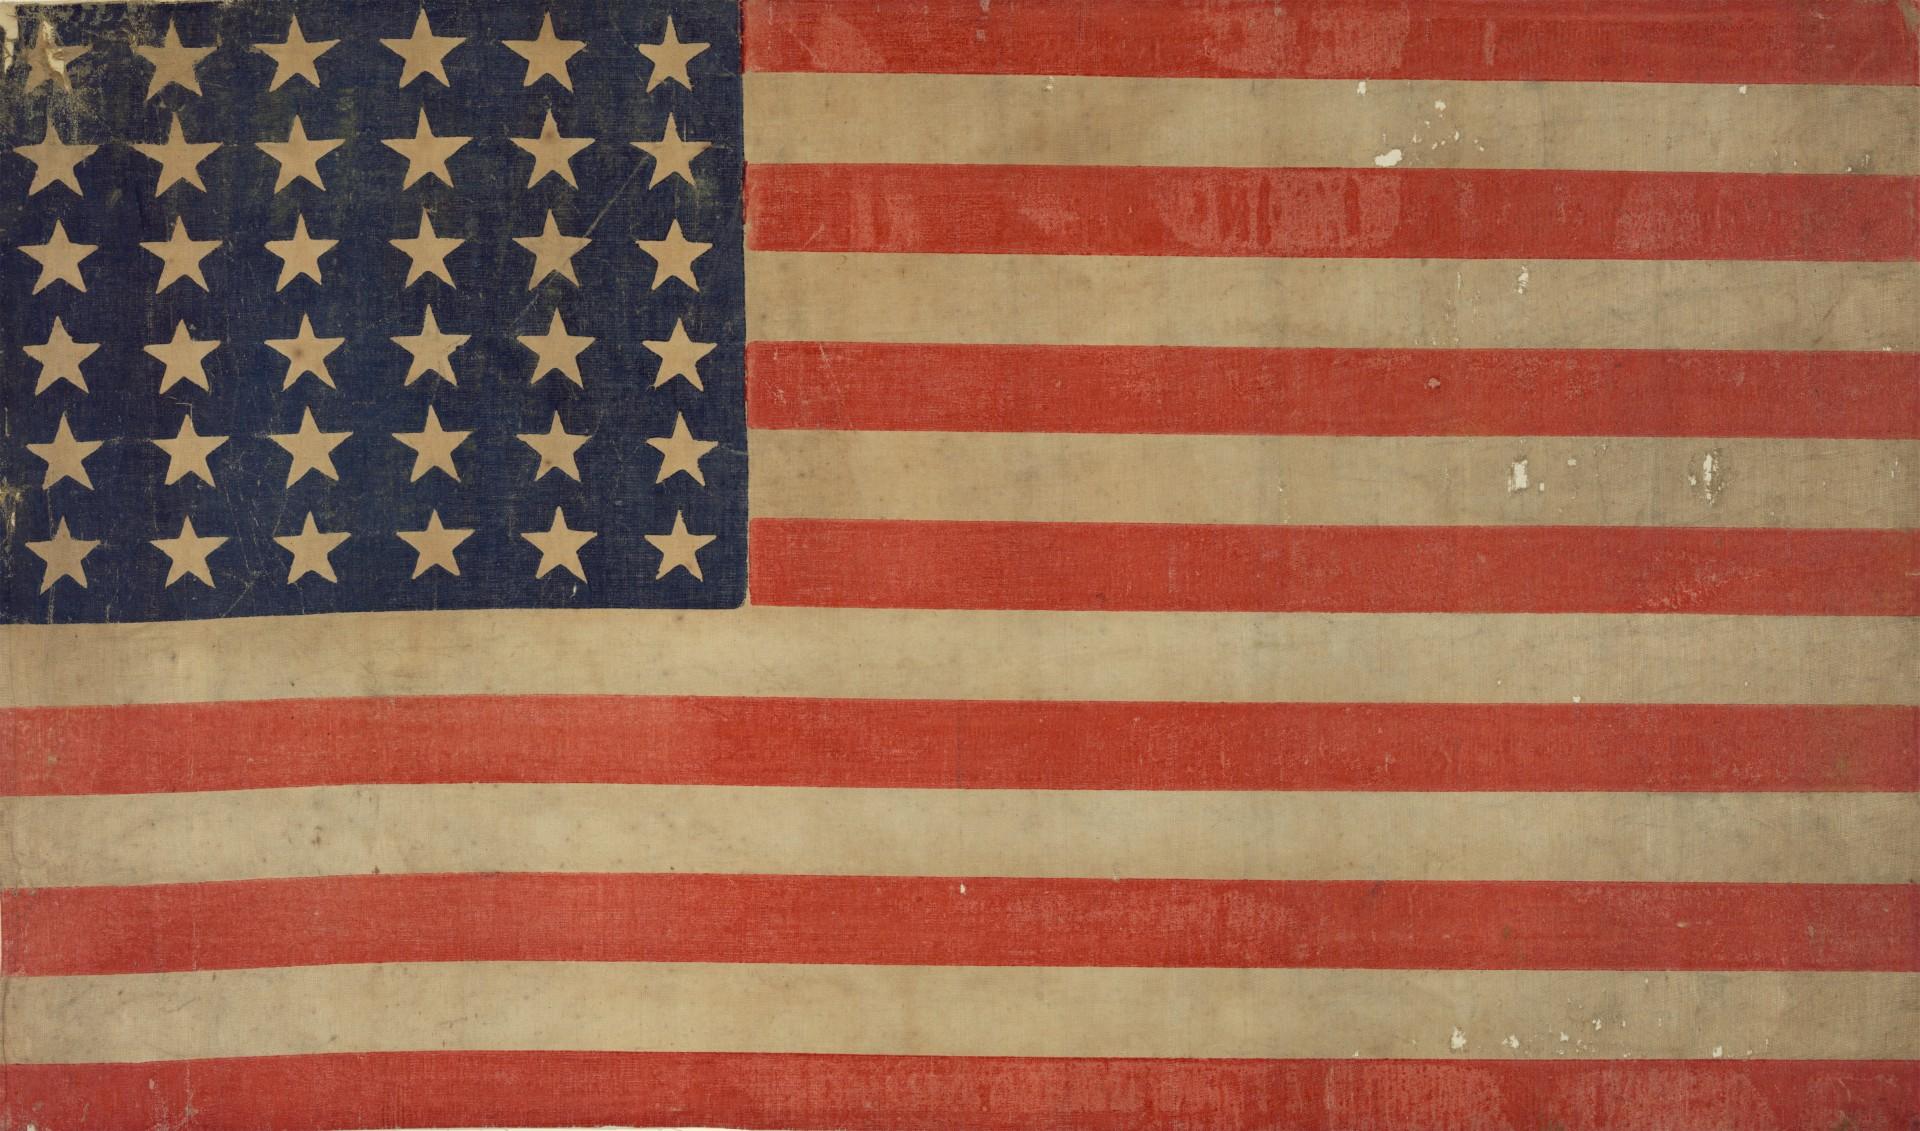 Grunge American Flag Background Free Stock Photo - Public Domain ...